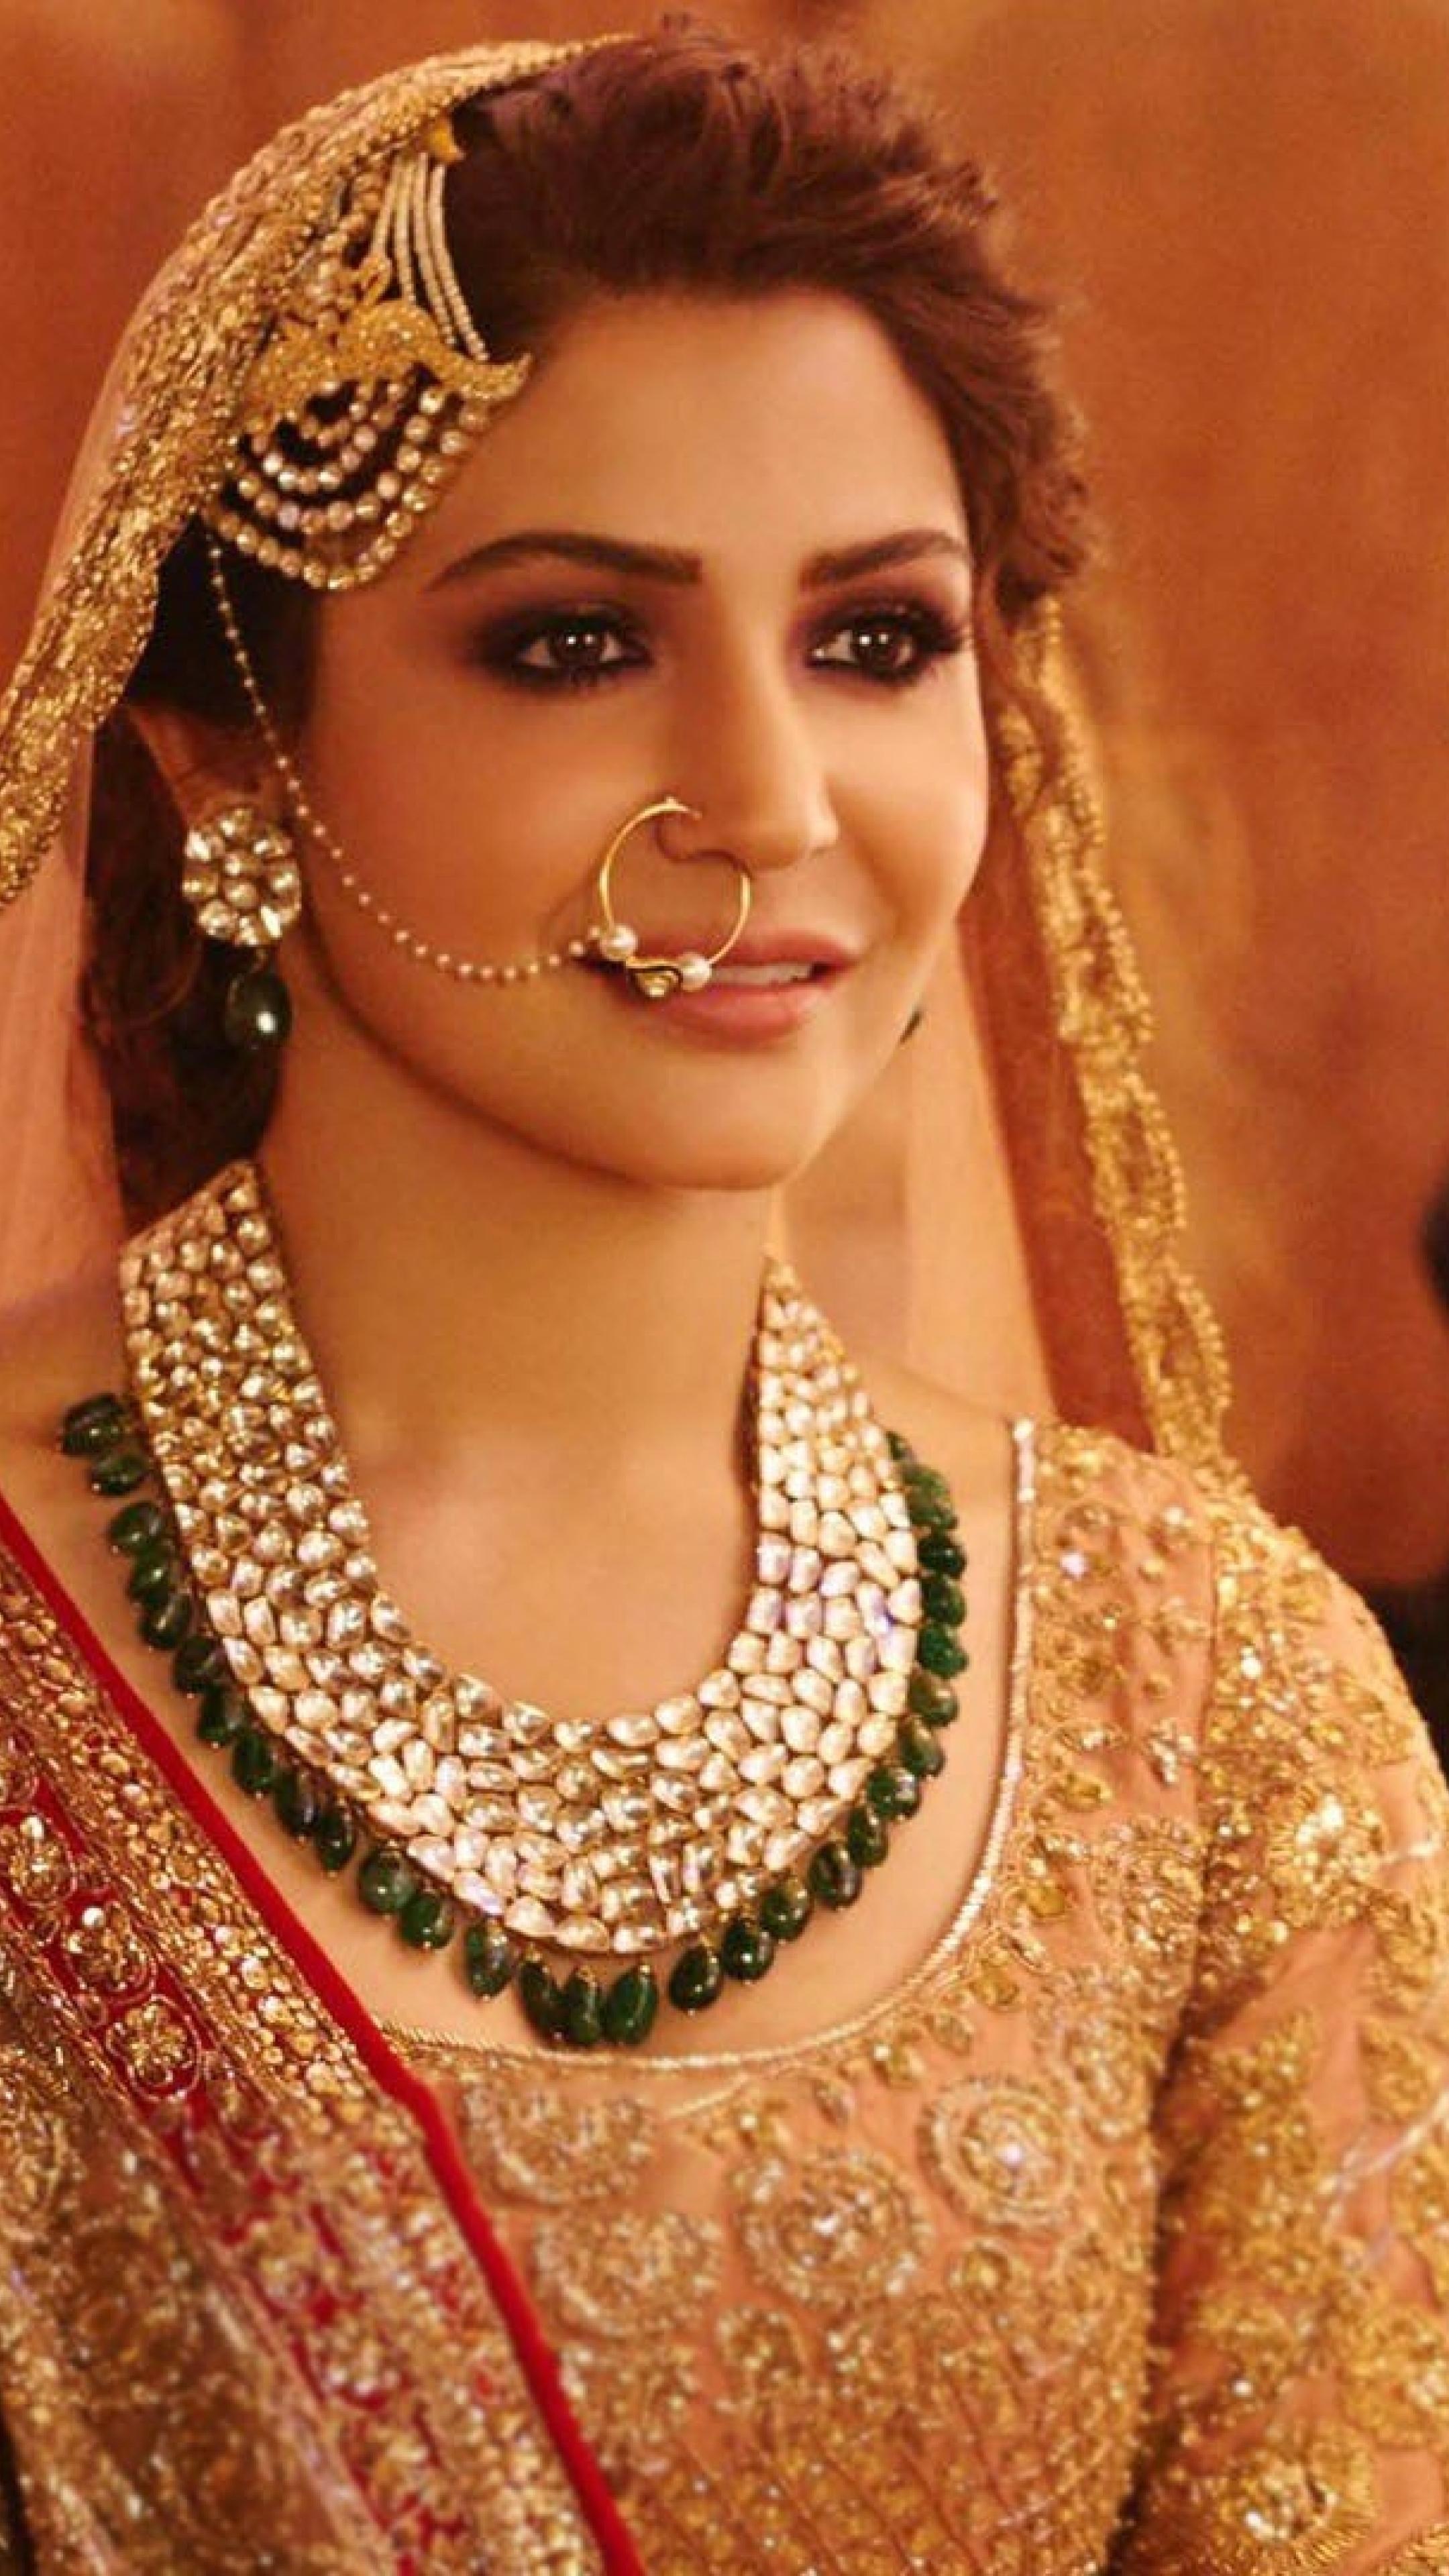 Anushka Sharma From Ae Dil Hai Mushkil, Full HD Wallpaper